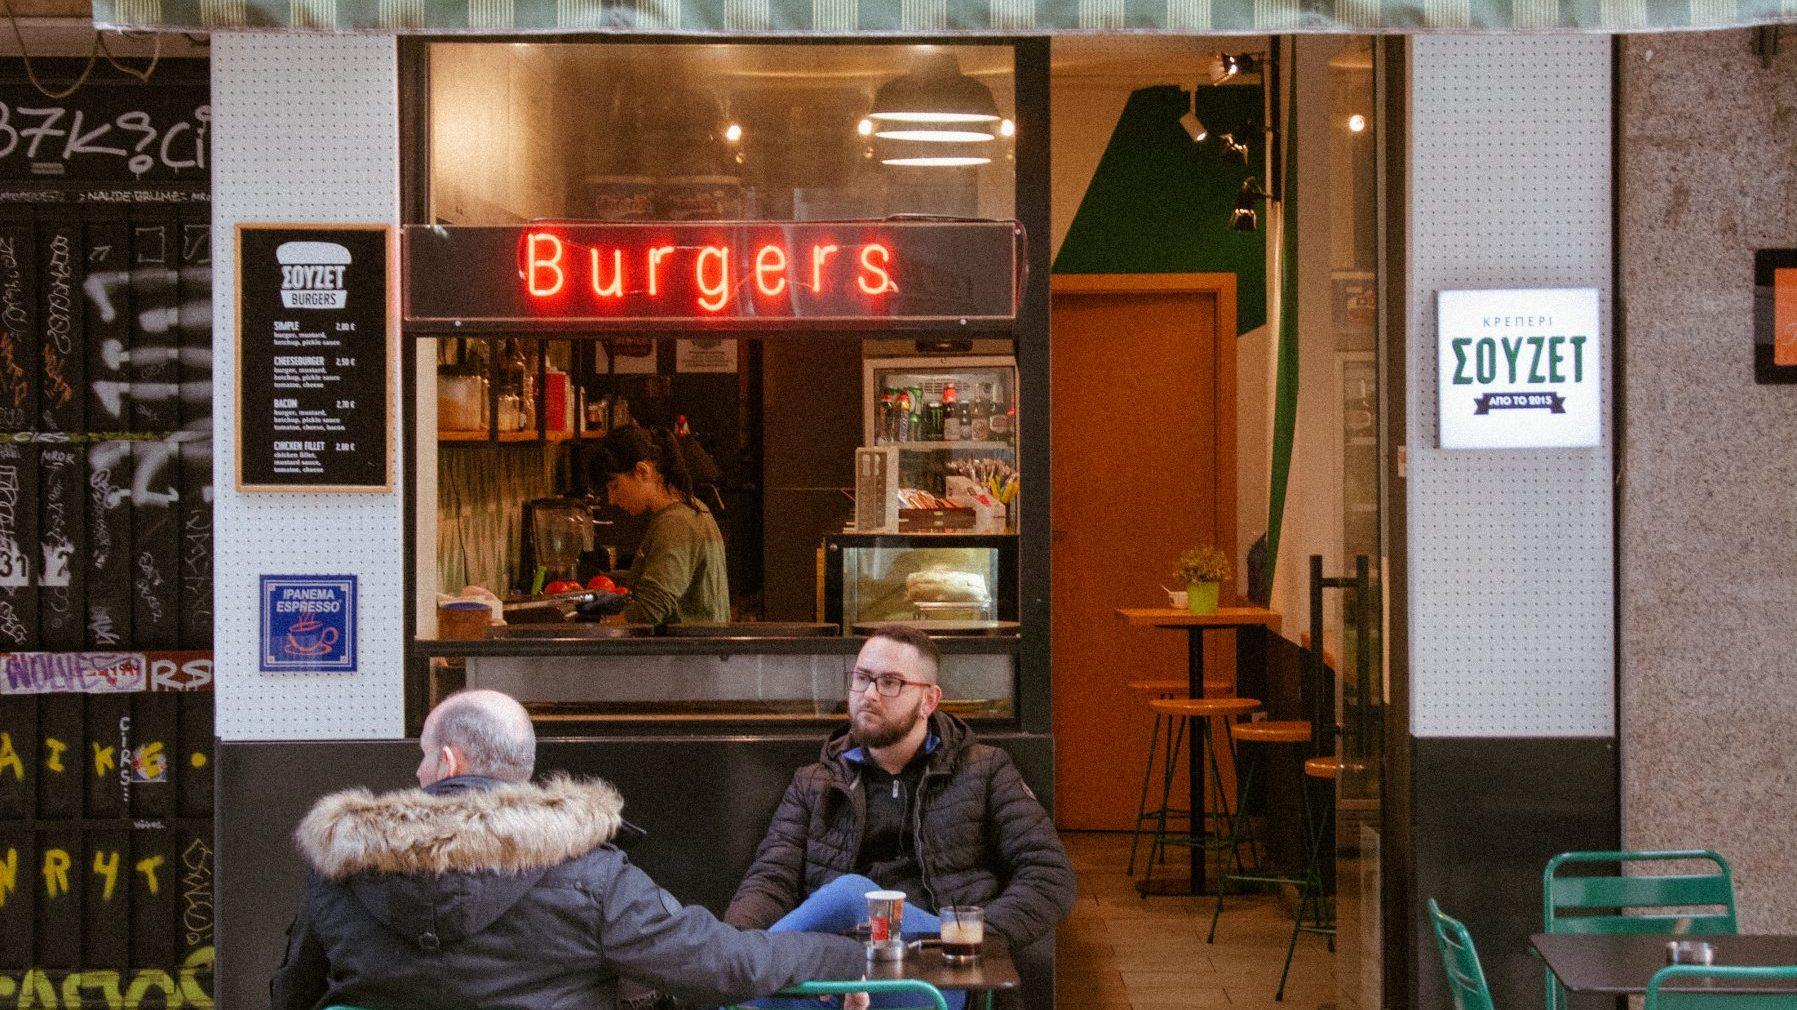 Souzet crepes street food